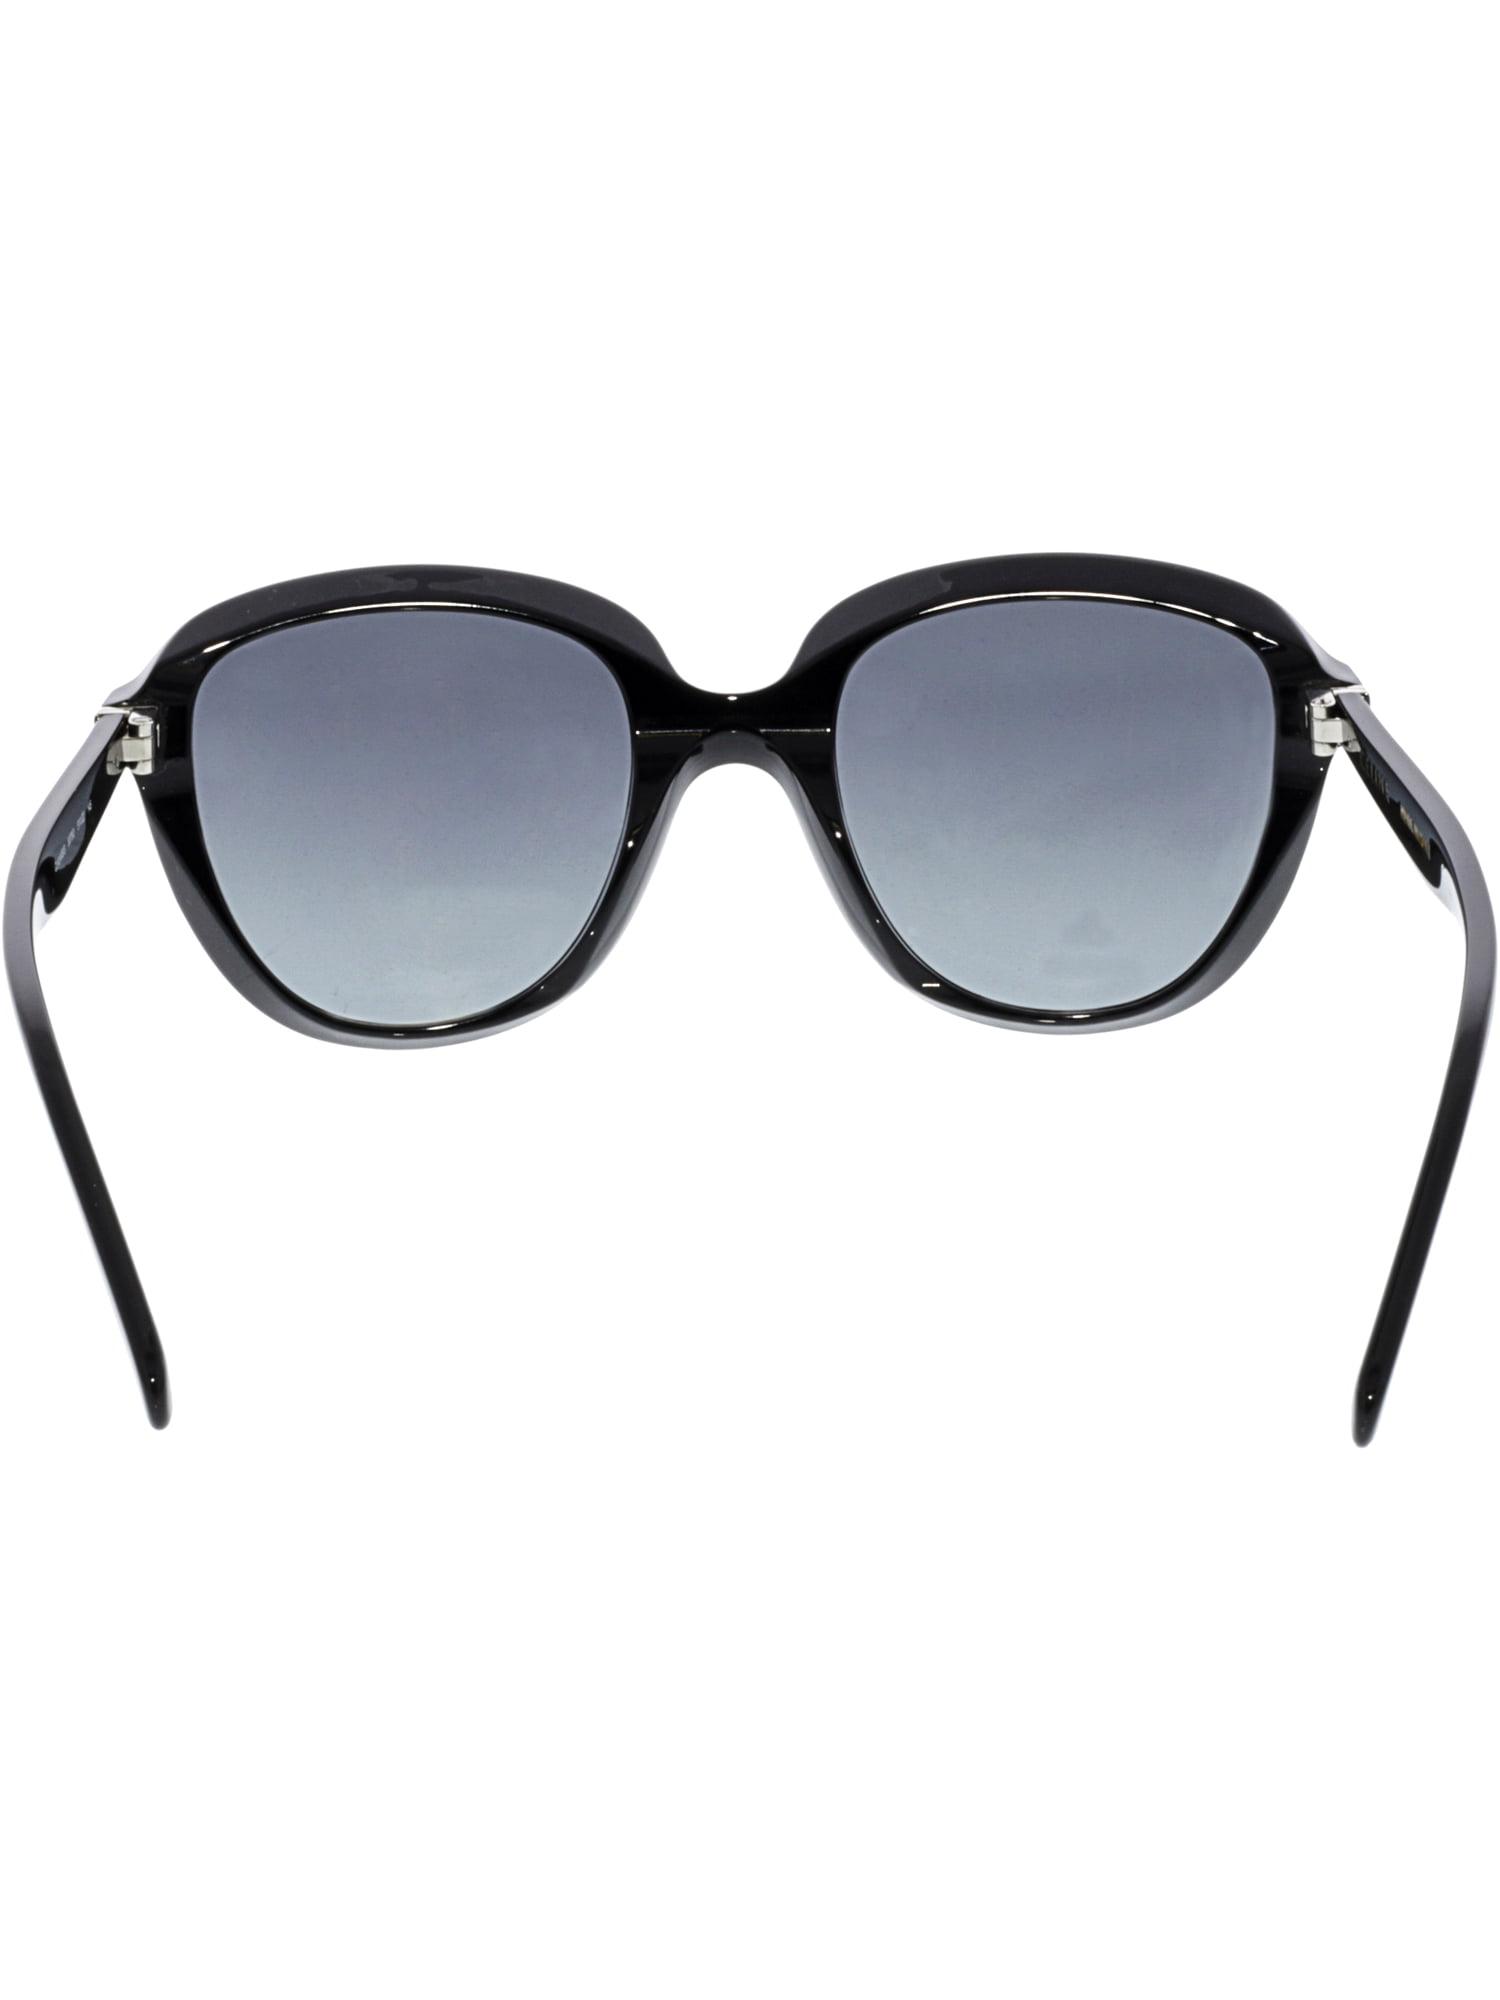 a2154e08711c Celine - Celine Women s CL41448S-807-51 Black Oval Sunglasses - Walmart.com